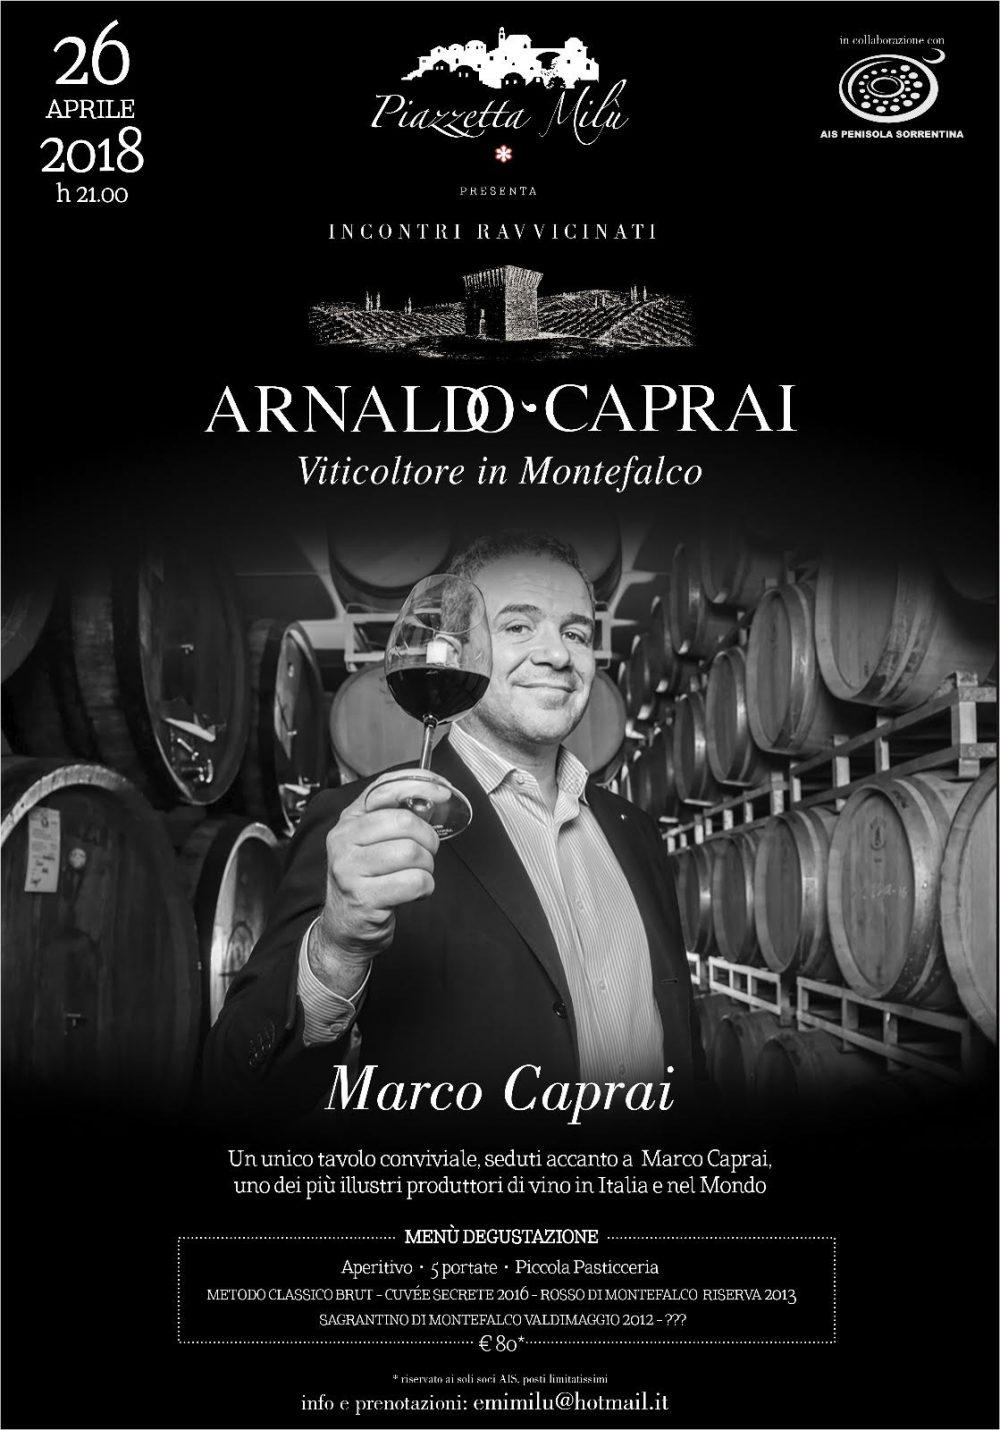 INCONTRI RAVVICINATI Marco Caprai